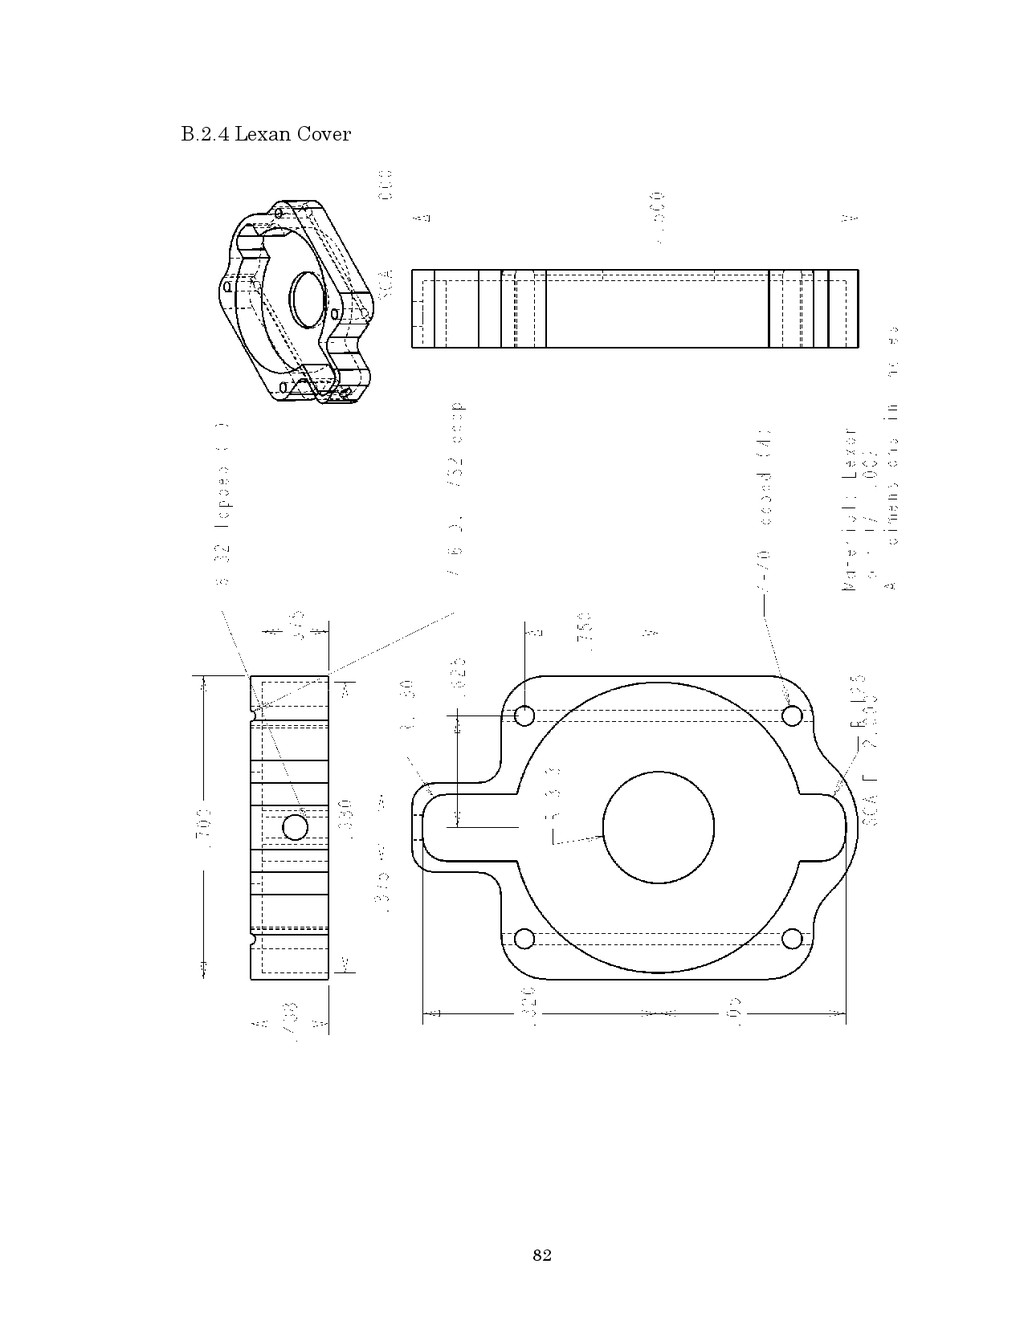 82 B.2.4 Lexan Cover